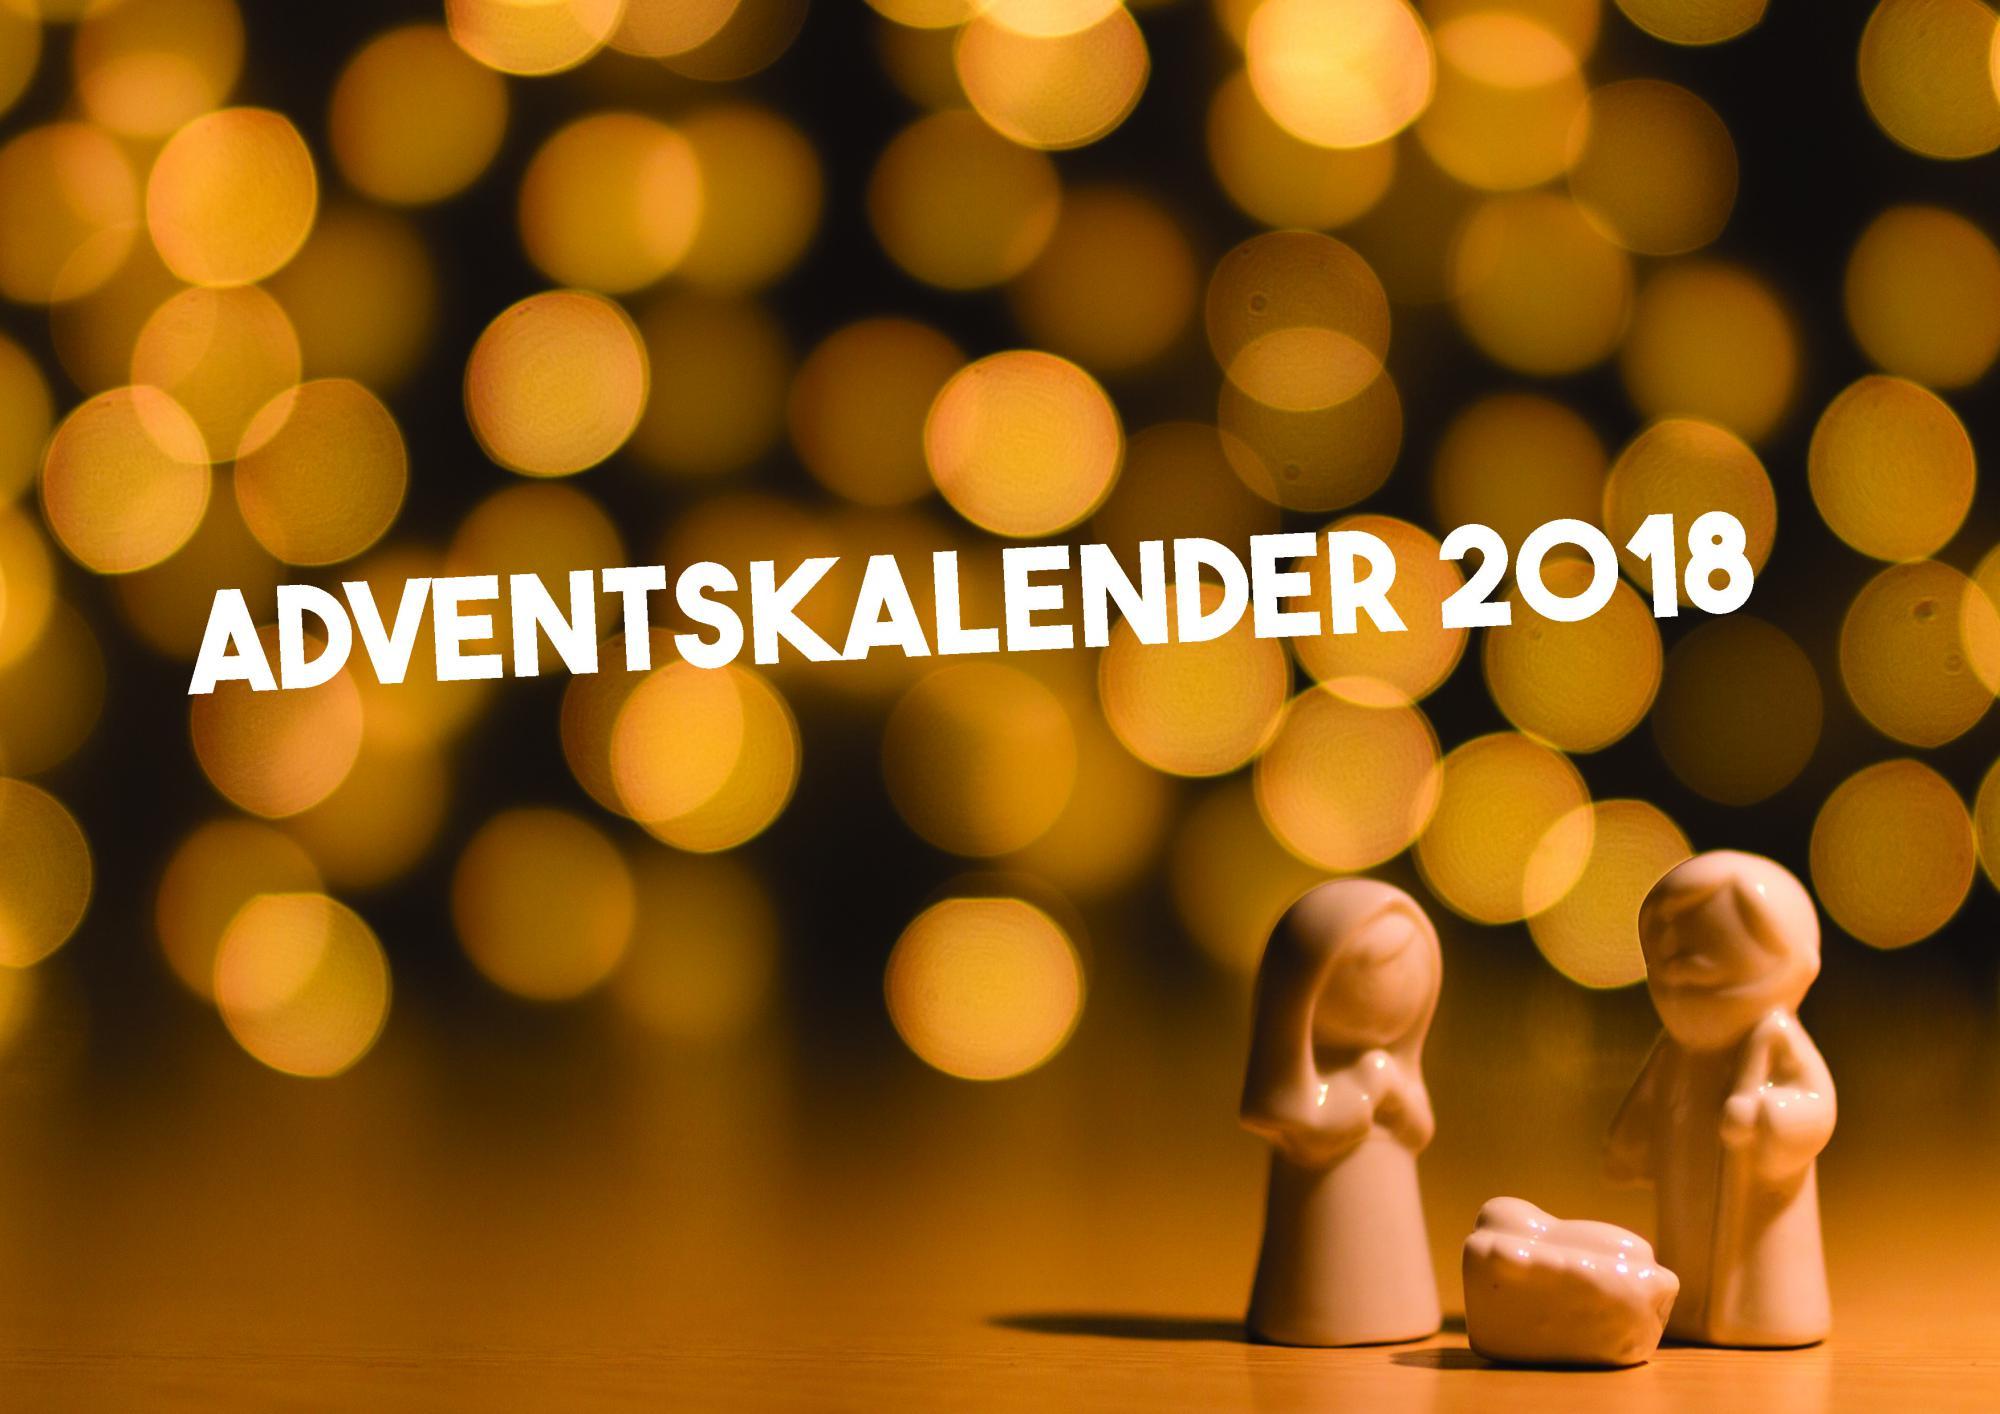 Adventskalender 2018  © Gezinspastoraal bisdom Antwerpen